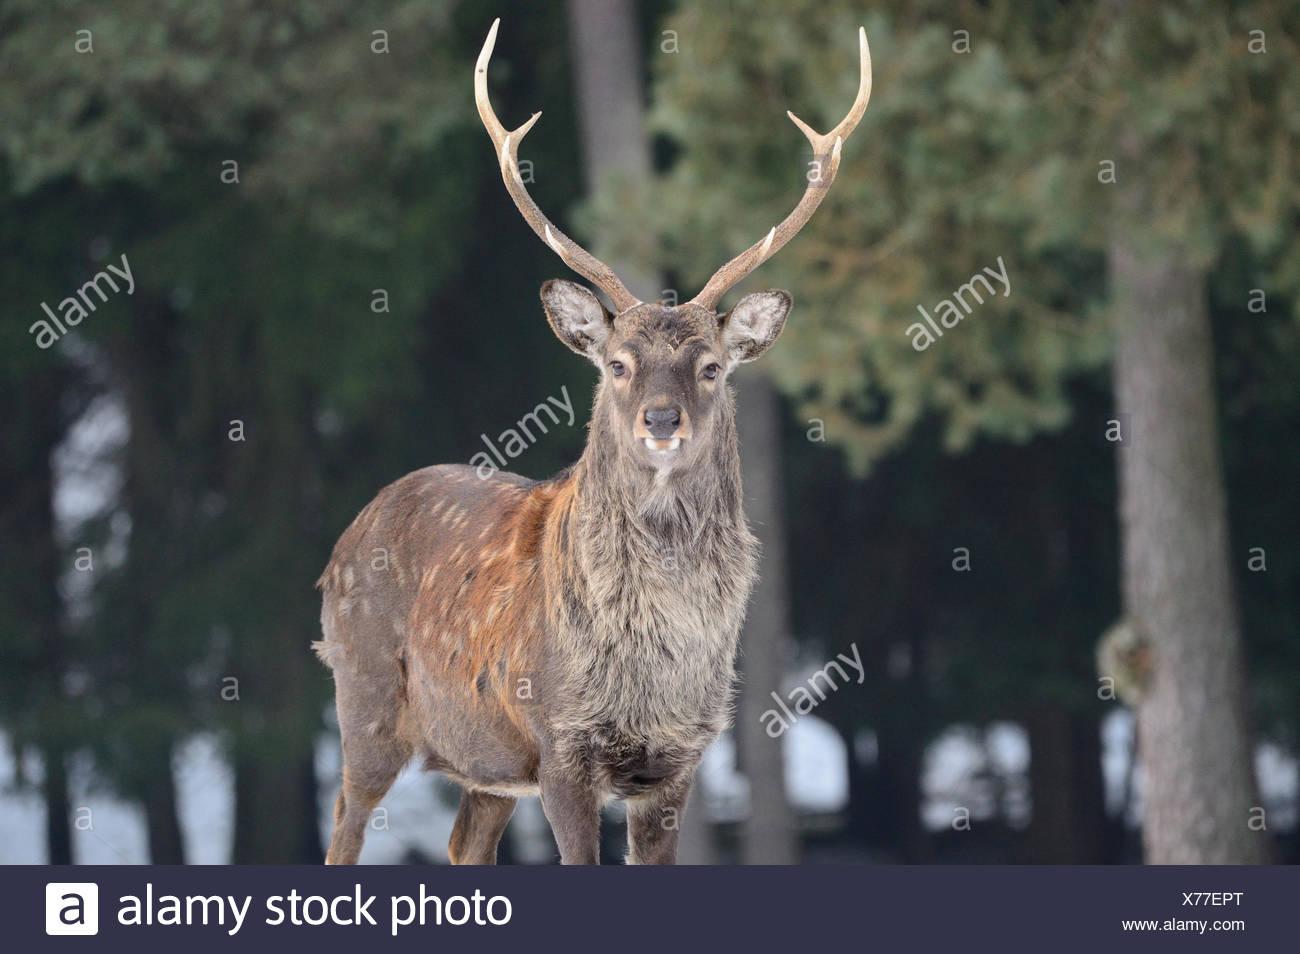 Sika, Tier, Tier, Winter, japanische Reh, Hirsch, Hirsch, Cervus Nippon, Rehe, Hirsche, Tiere, Wildtiere, asiatische Rotwild, Brunft Meer Stockbild